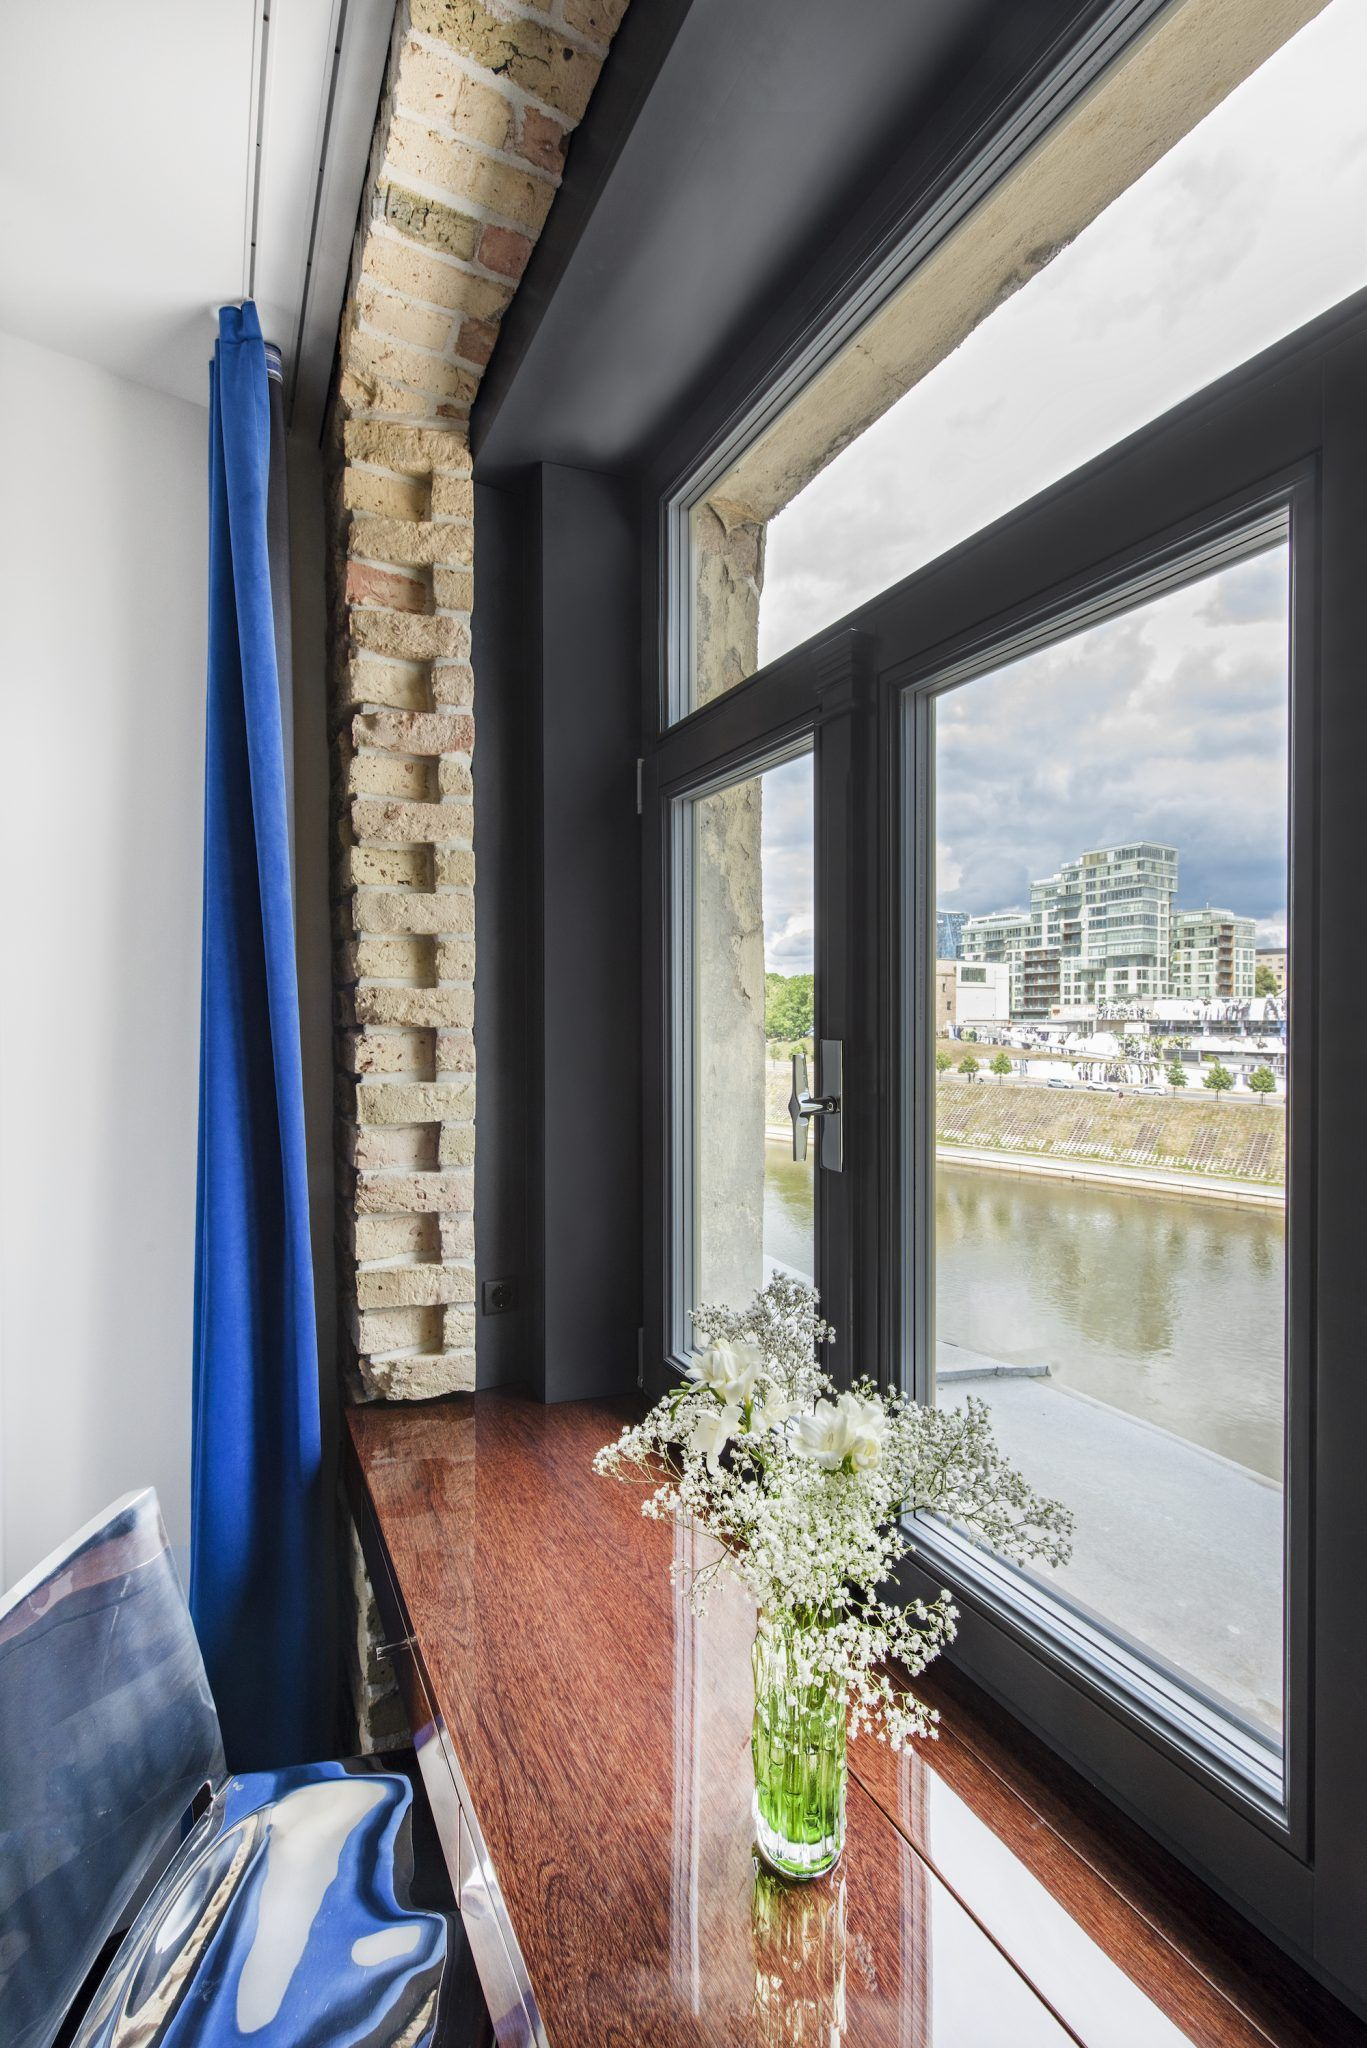 Wooden Window Sill Table By Baldų Mozaika Signature Hotel Wooden Windows Window Sill